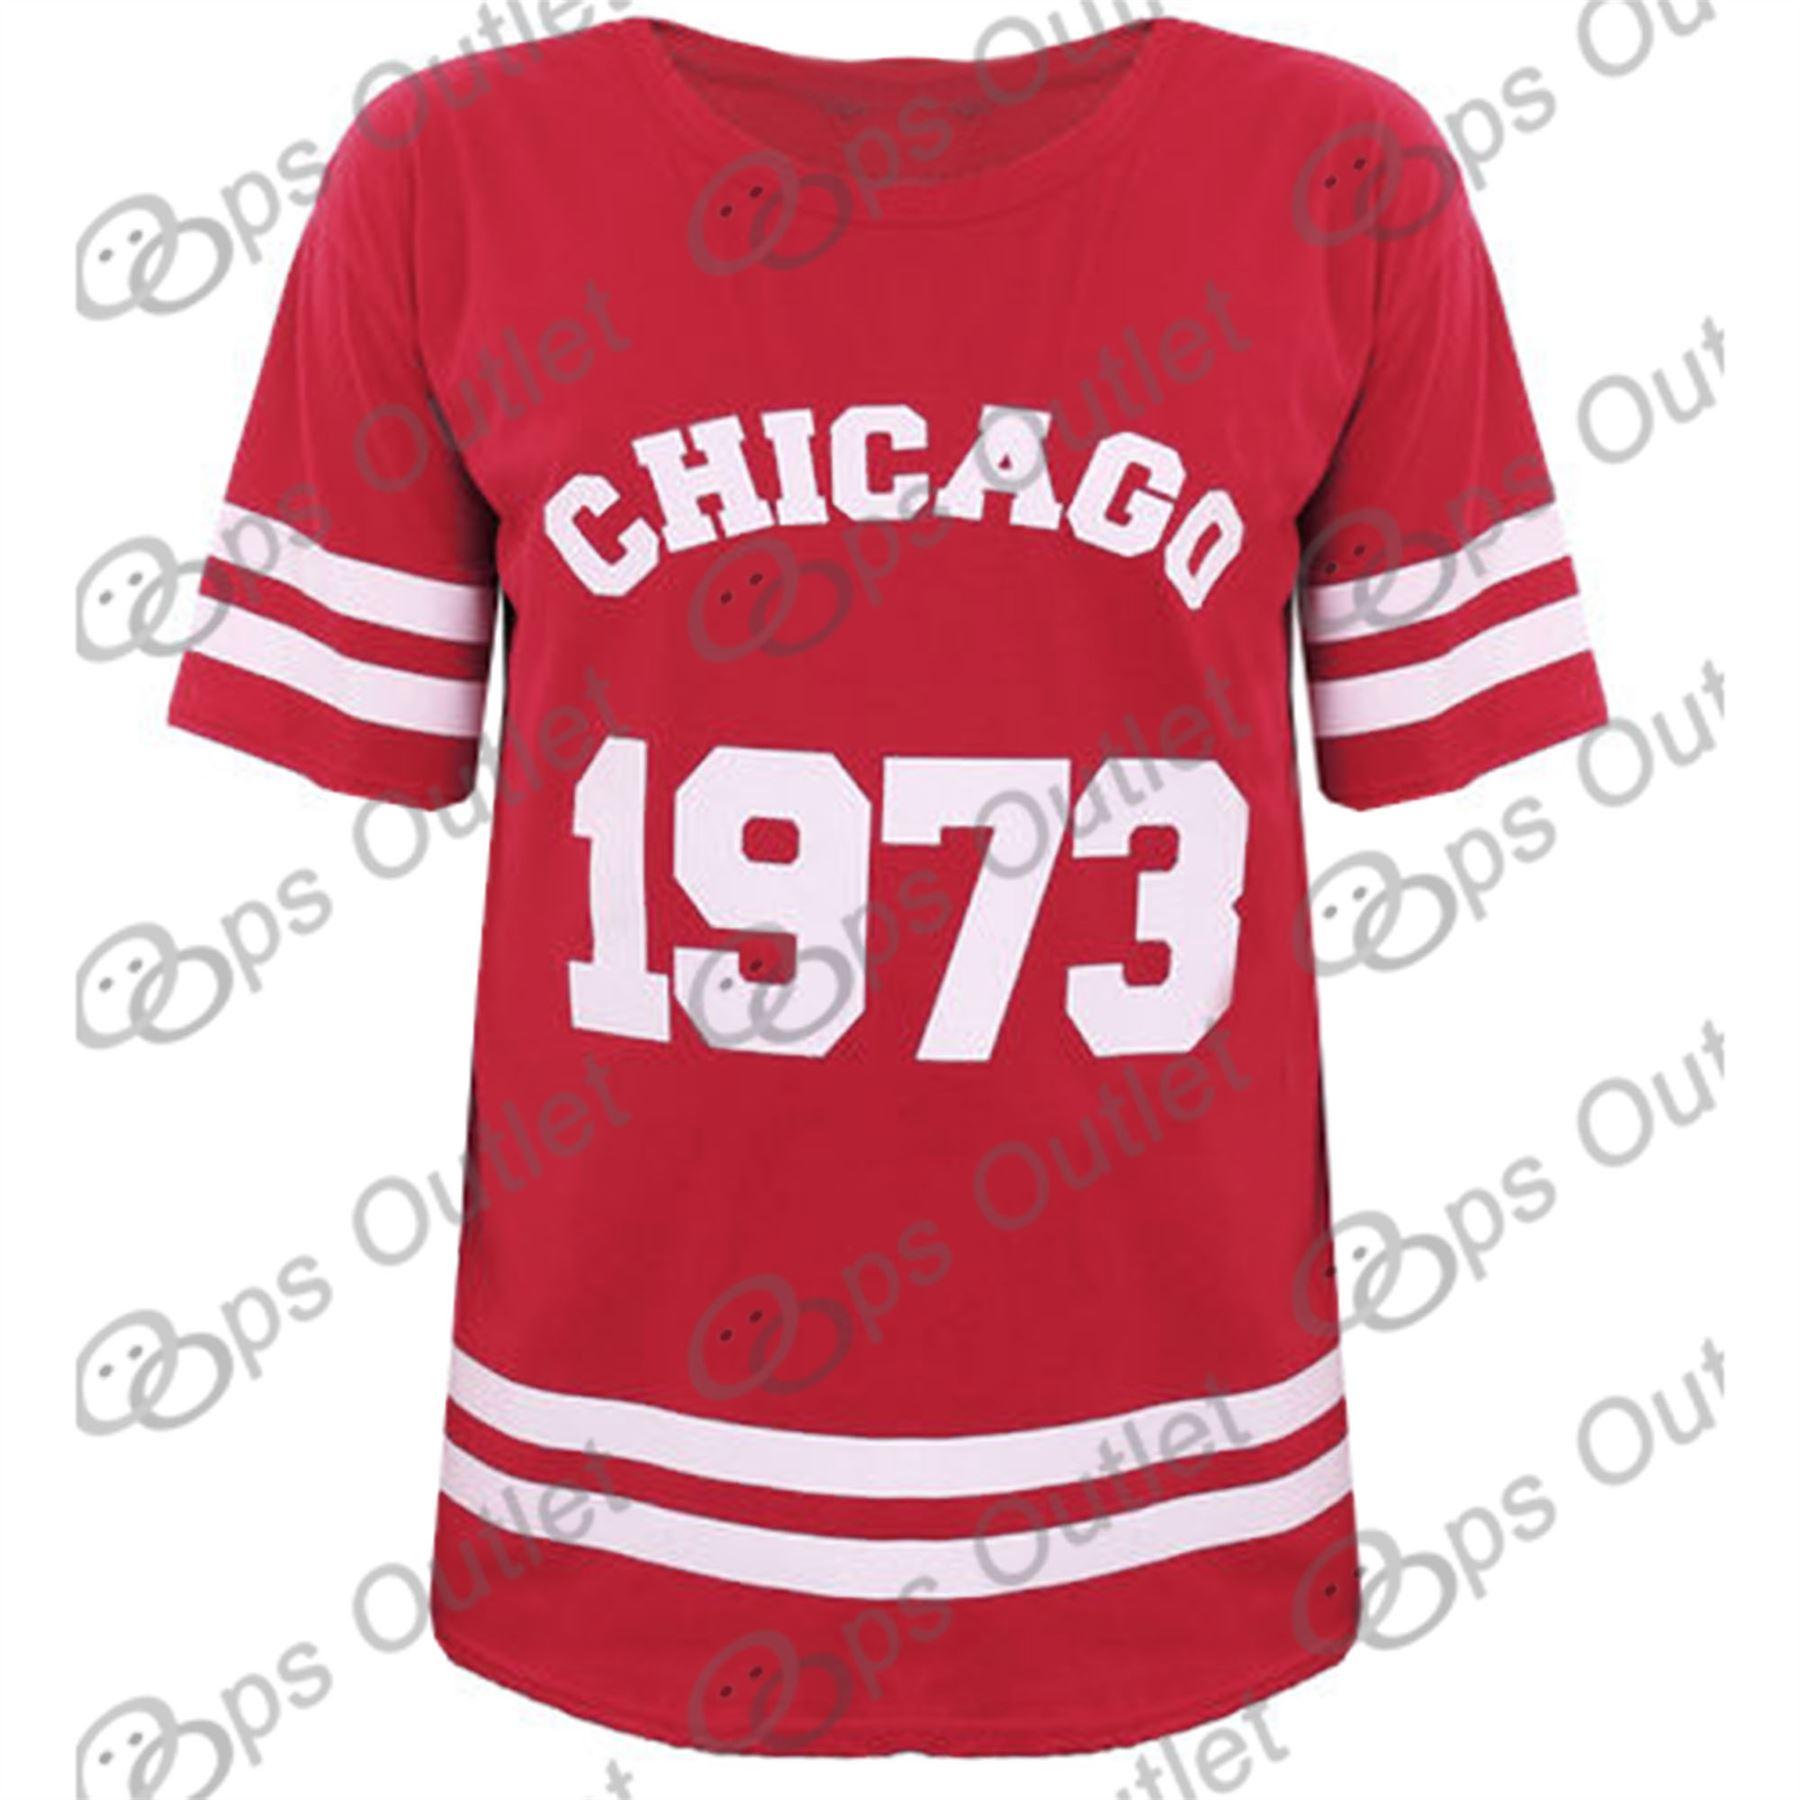 Womens ladies baggy oversized baseball cheerleader chicago for Best baseball t shirts